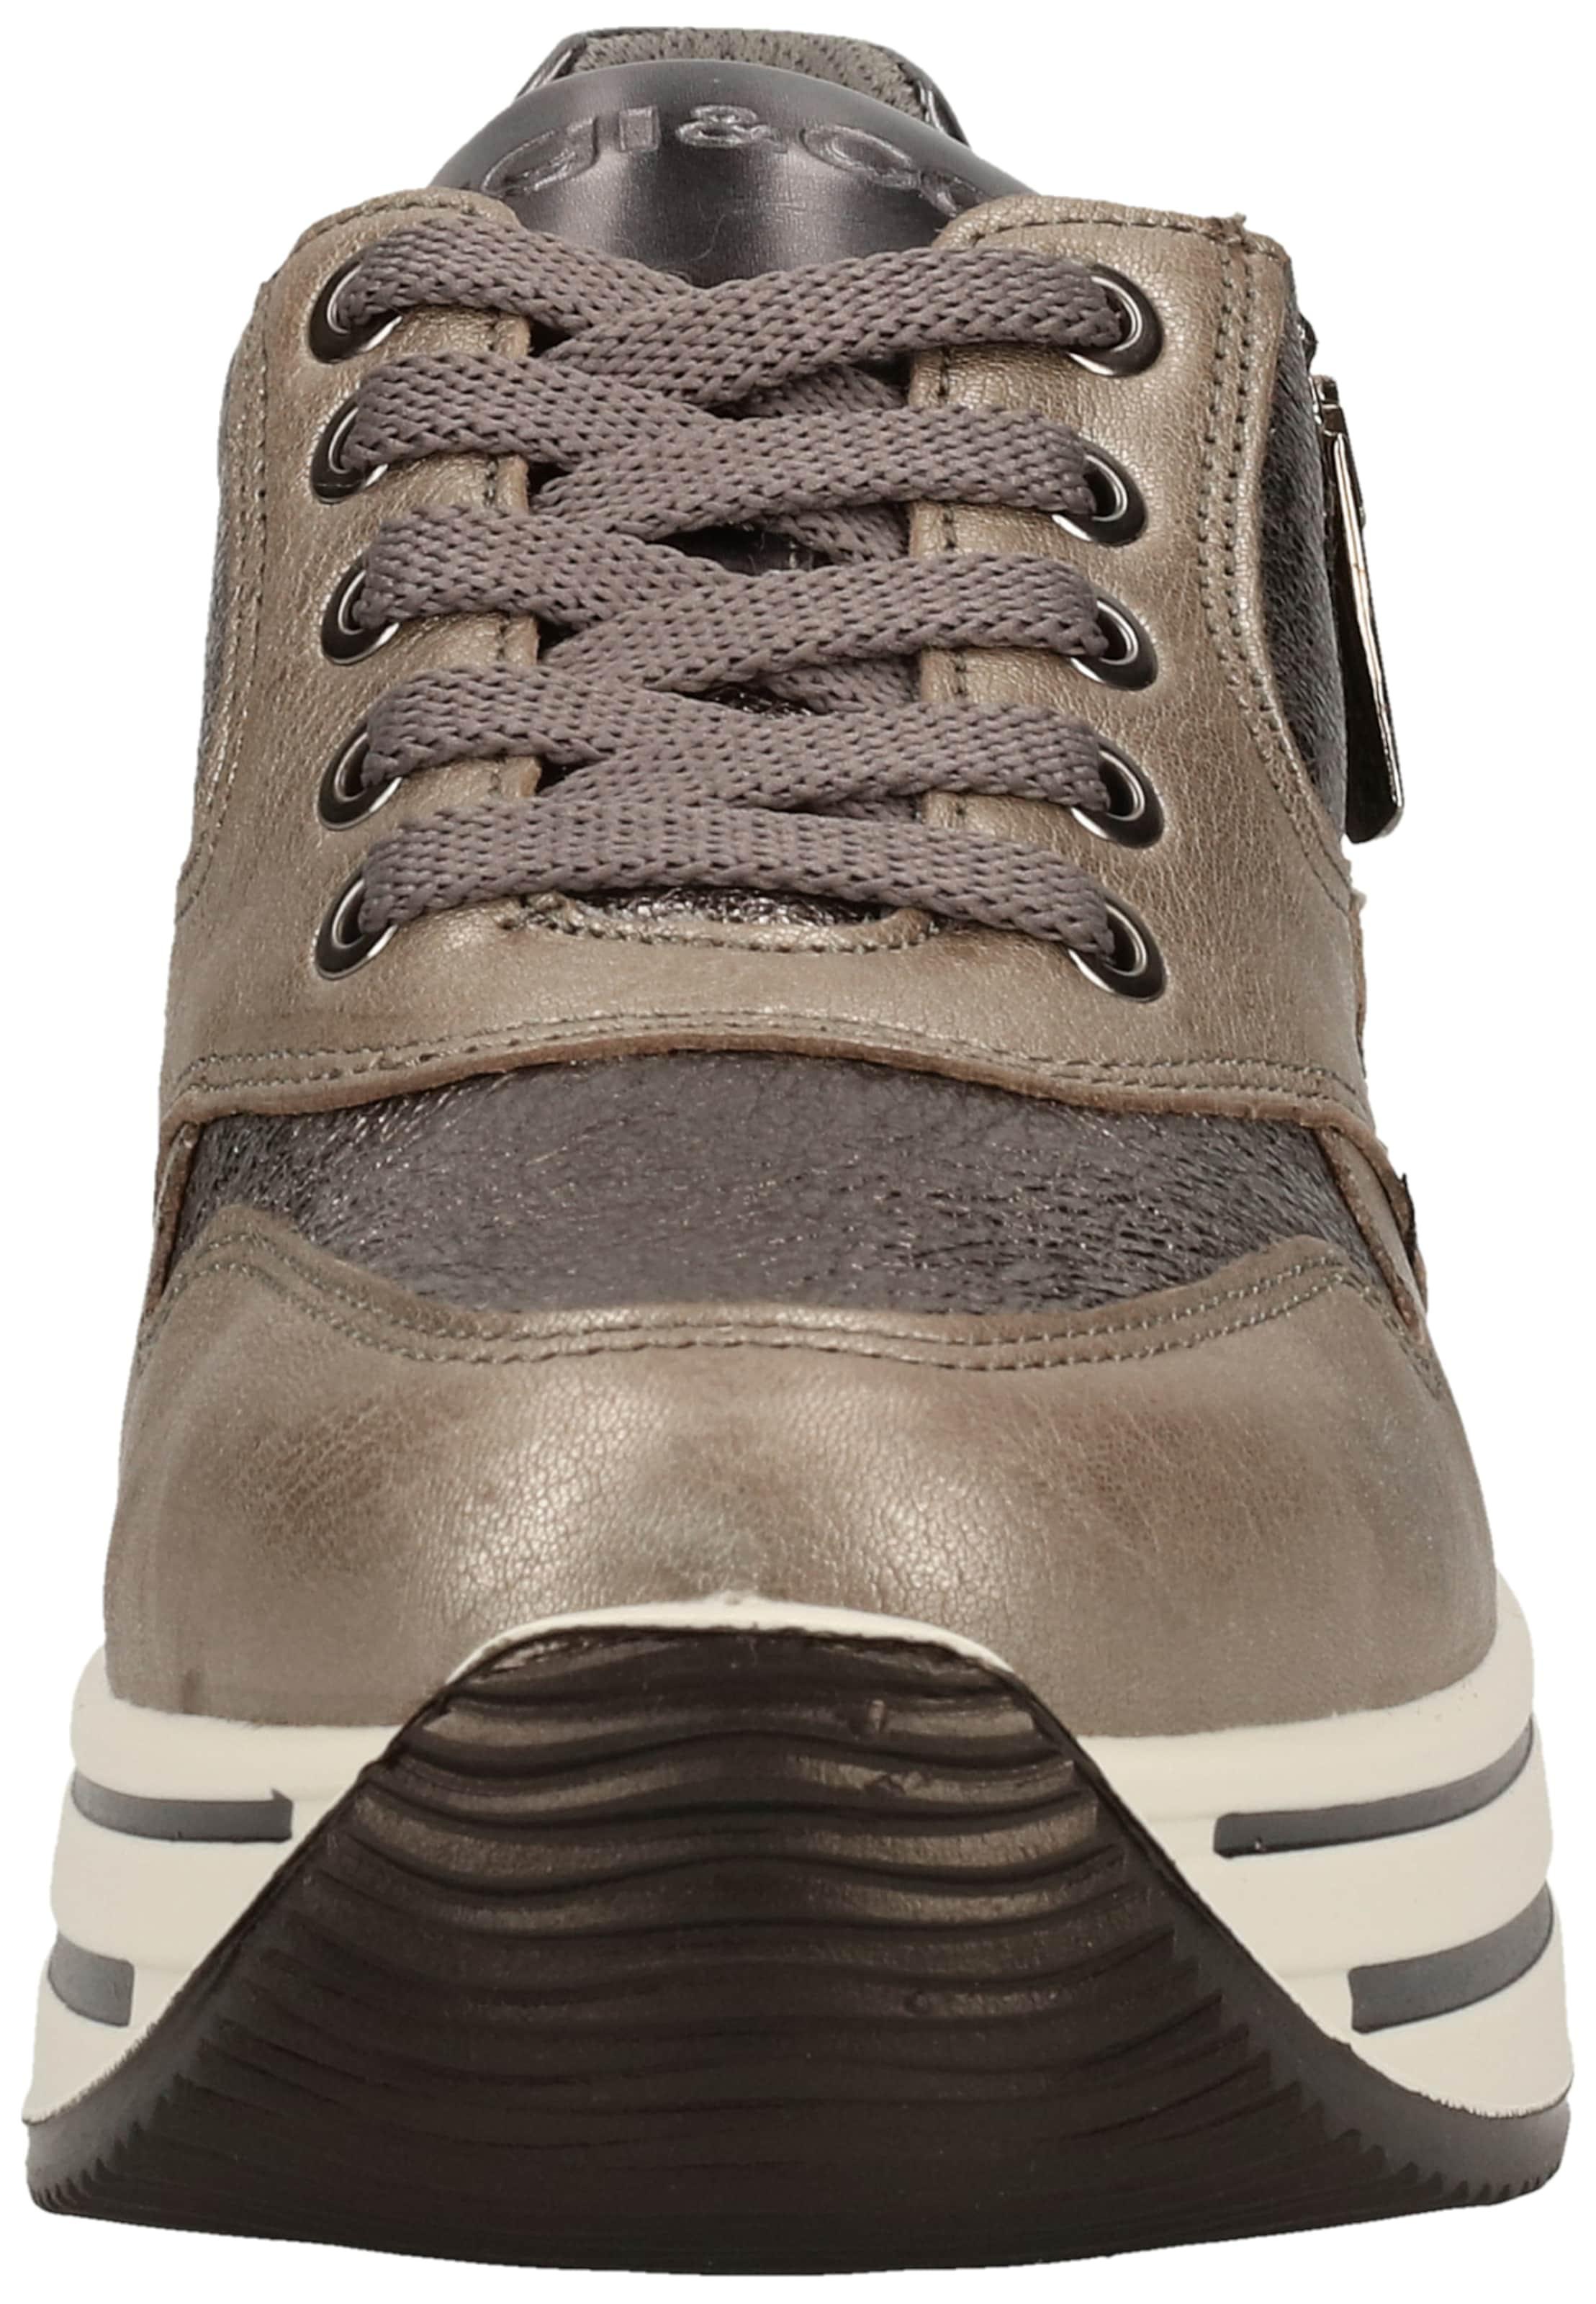 IGI&CO Sneaker in grau / silbergrau